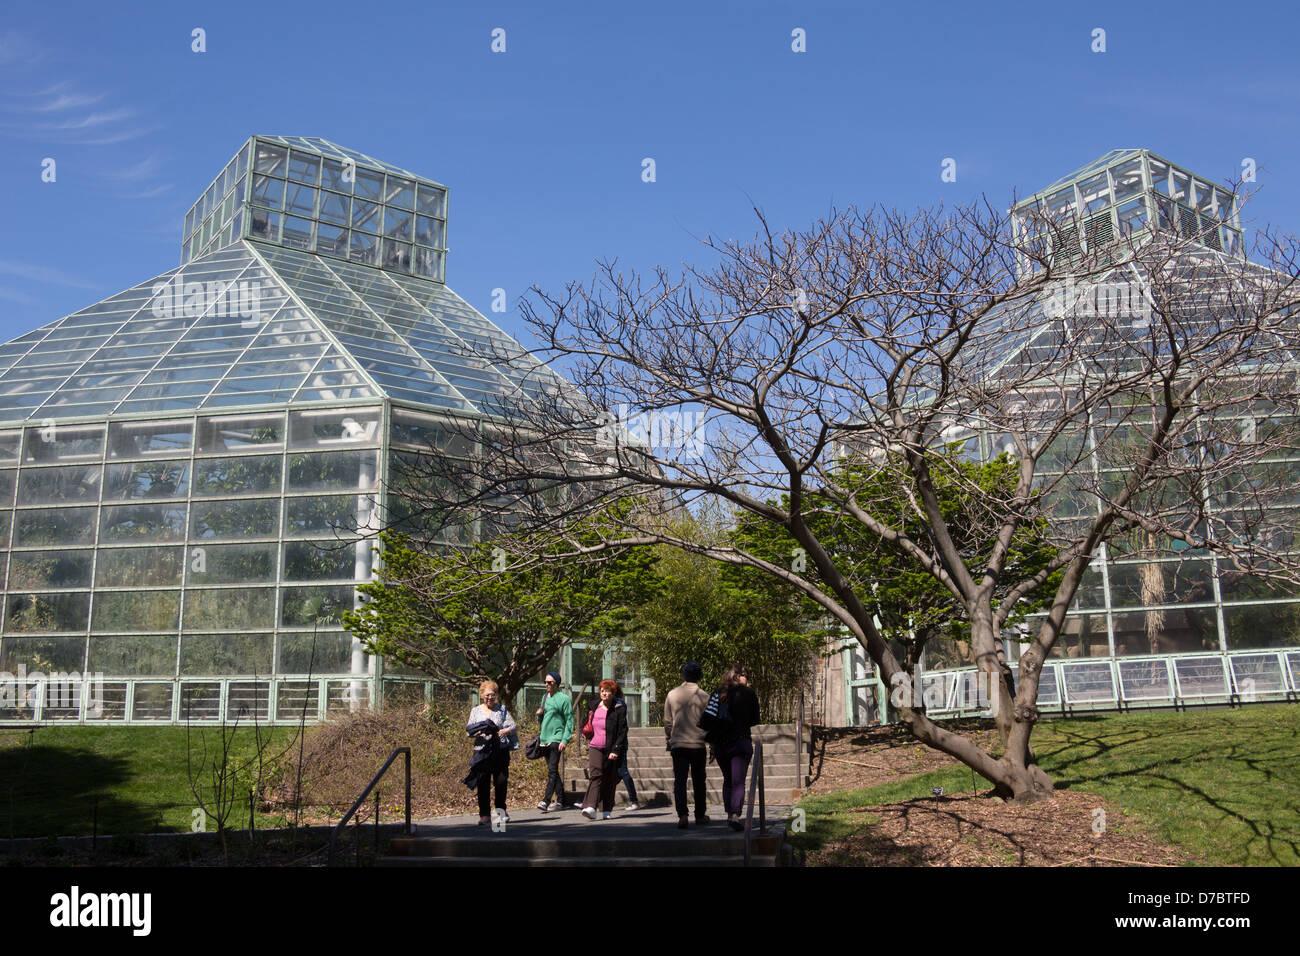 The Steinhardt Conservatory At The Brooklyn Botanic Garden New